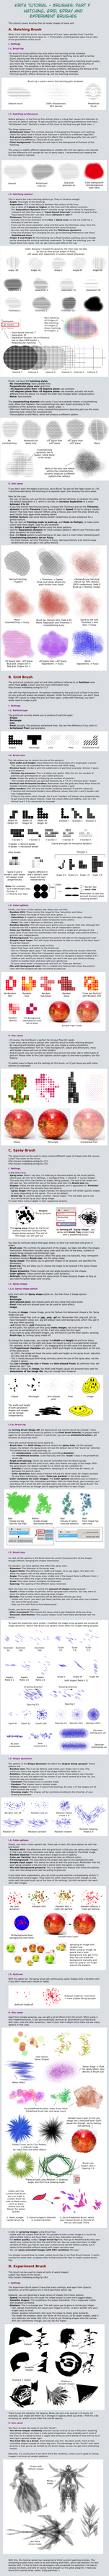 Krita brushes: Hatching, Grid, Spray, Experiment by White-Heron